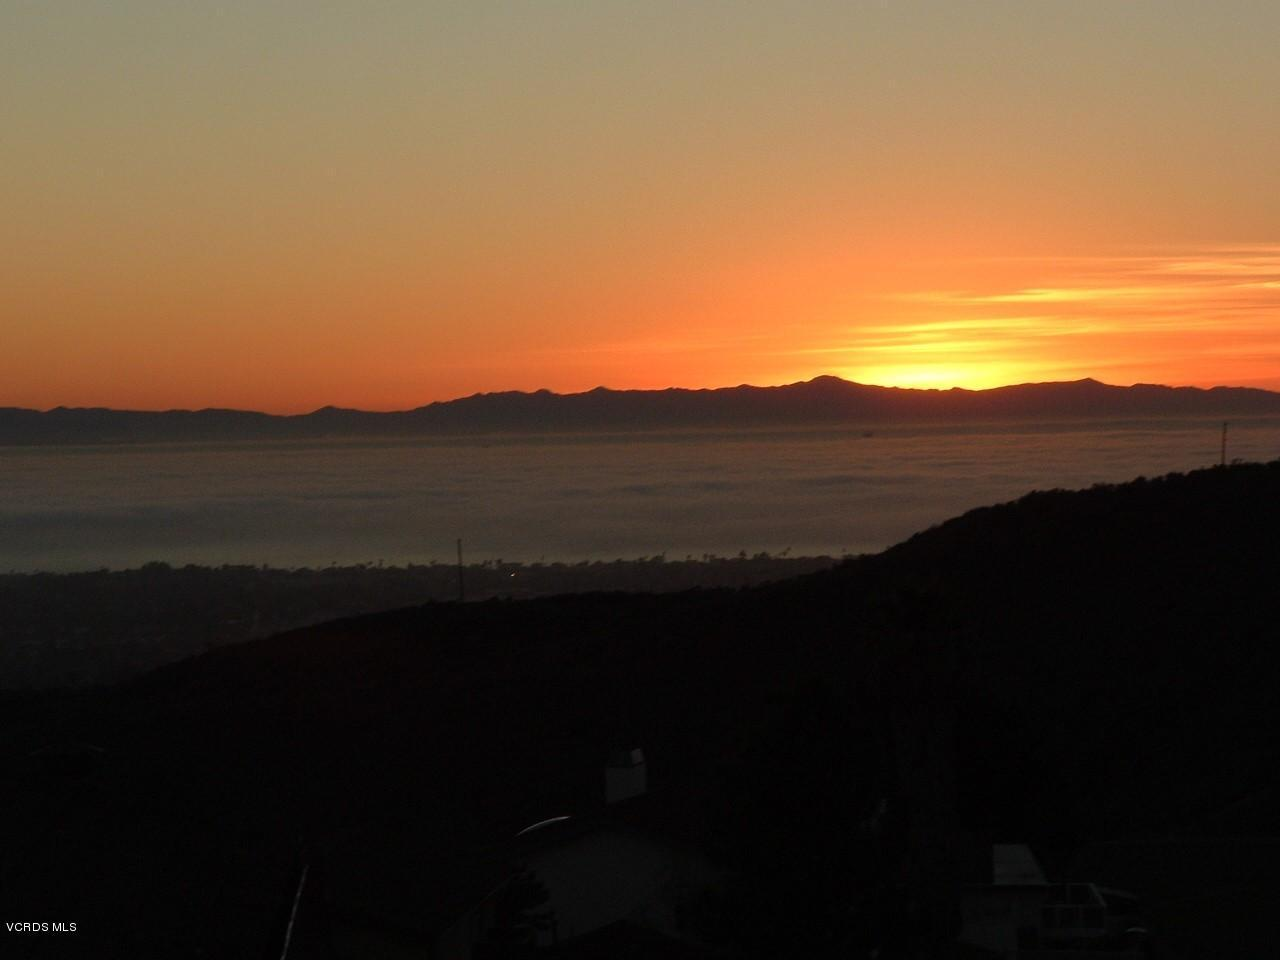 5519 TOPA TOPA, Ventura, CA 93003 - Sunset_Front_Yard[1]